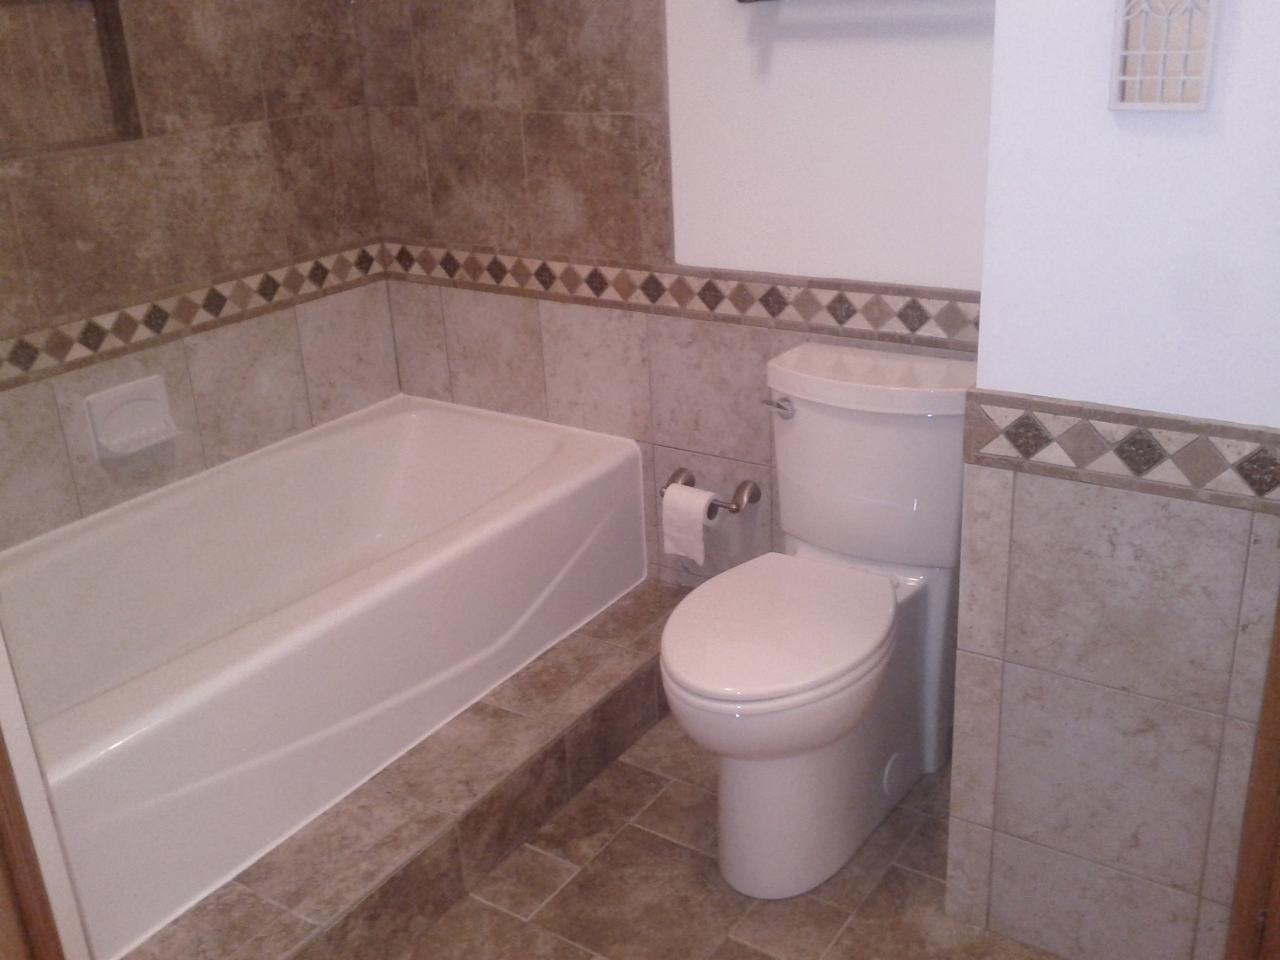 Tile Wainscoting Bathroom tiled waincoating |  is of a bathroom with tile wainscoting